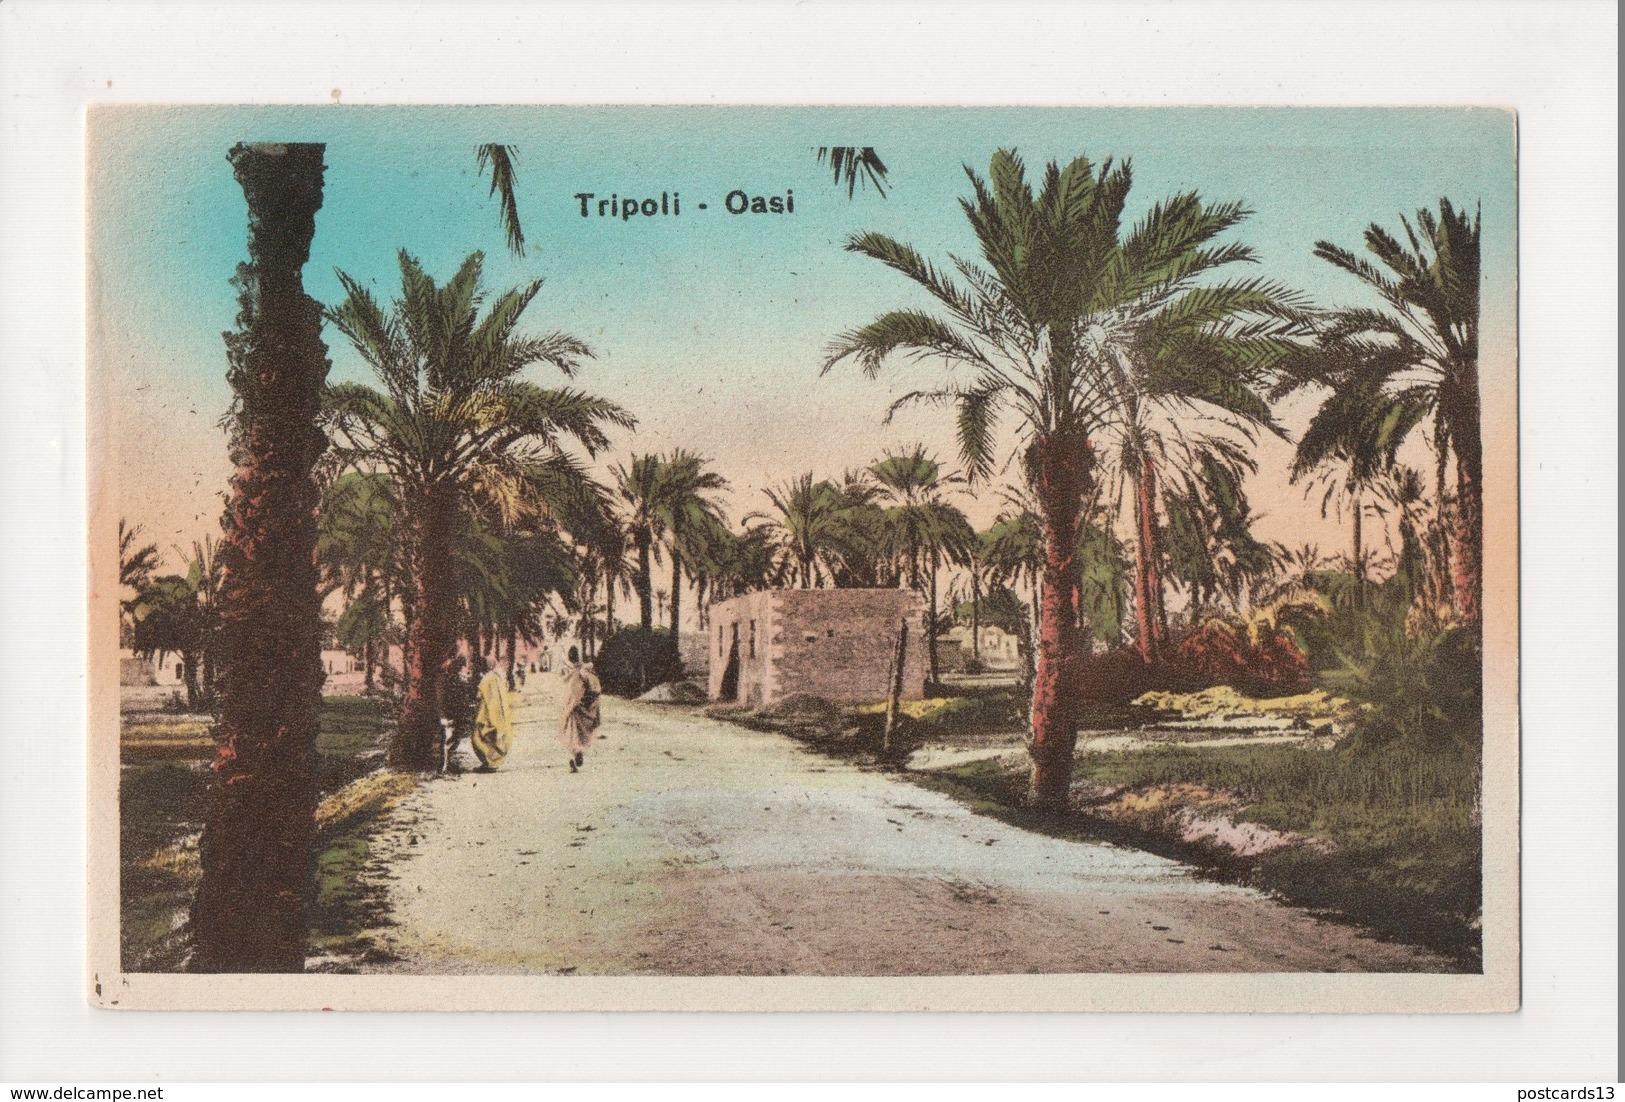 K-397 Libya Tripoli Oasi Hand Colored Vintage Postcard - Libya